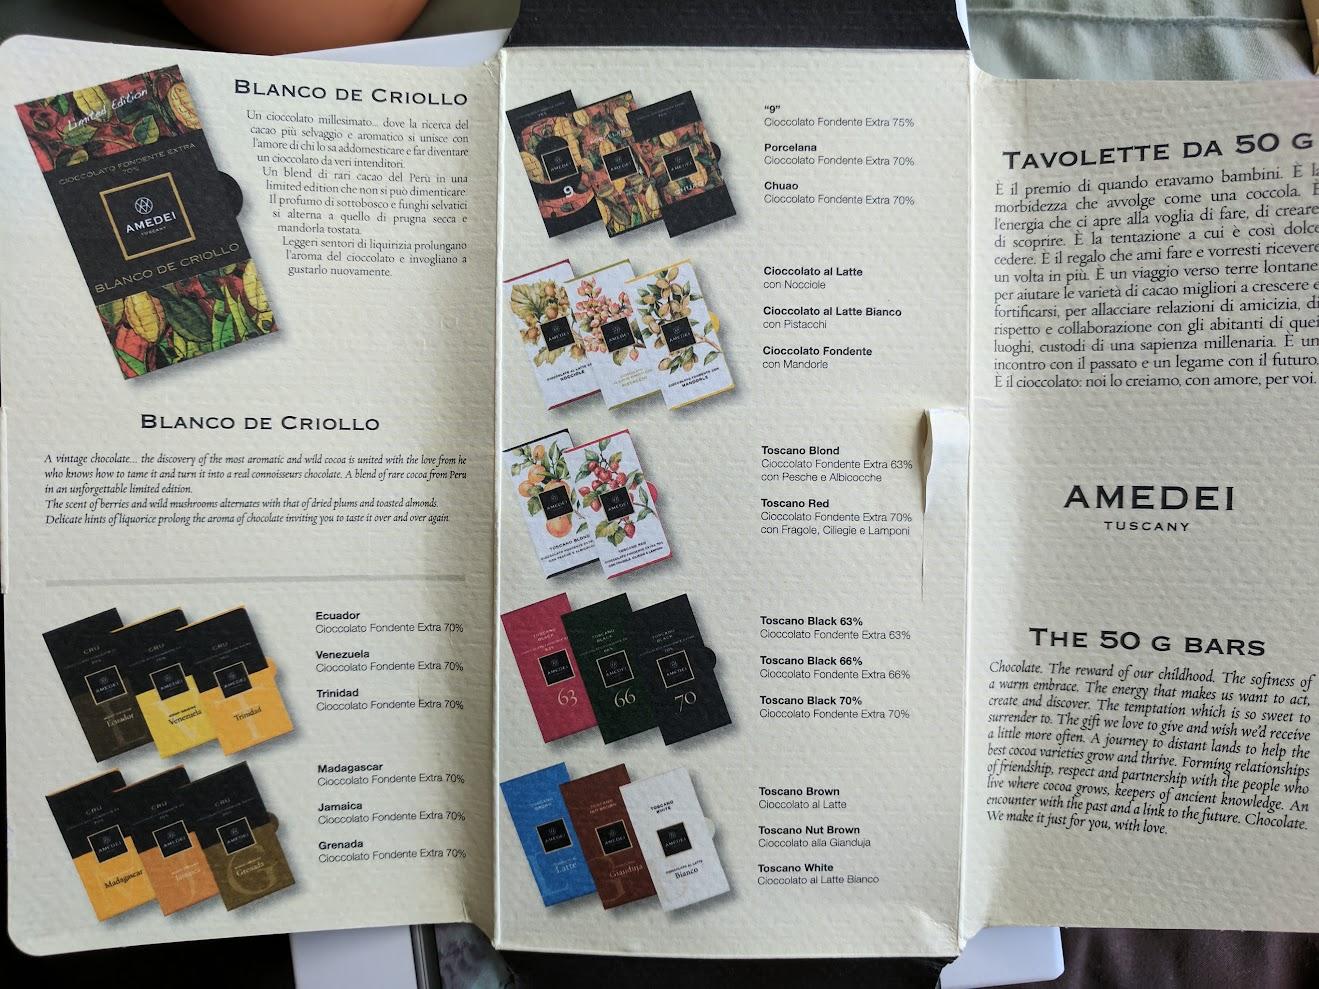 70% amedei blanco criollo bar packaging